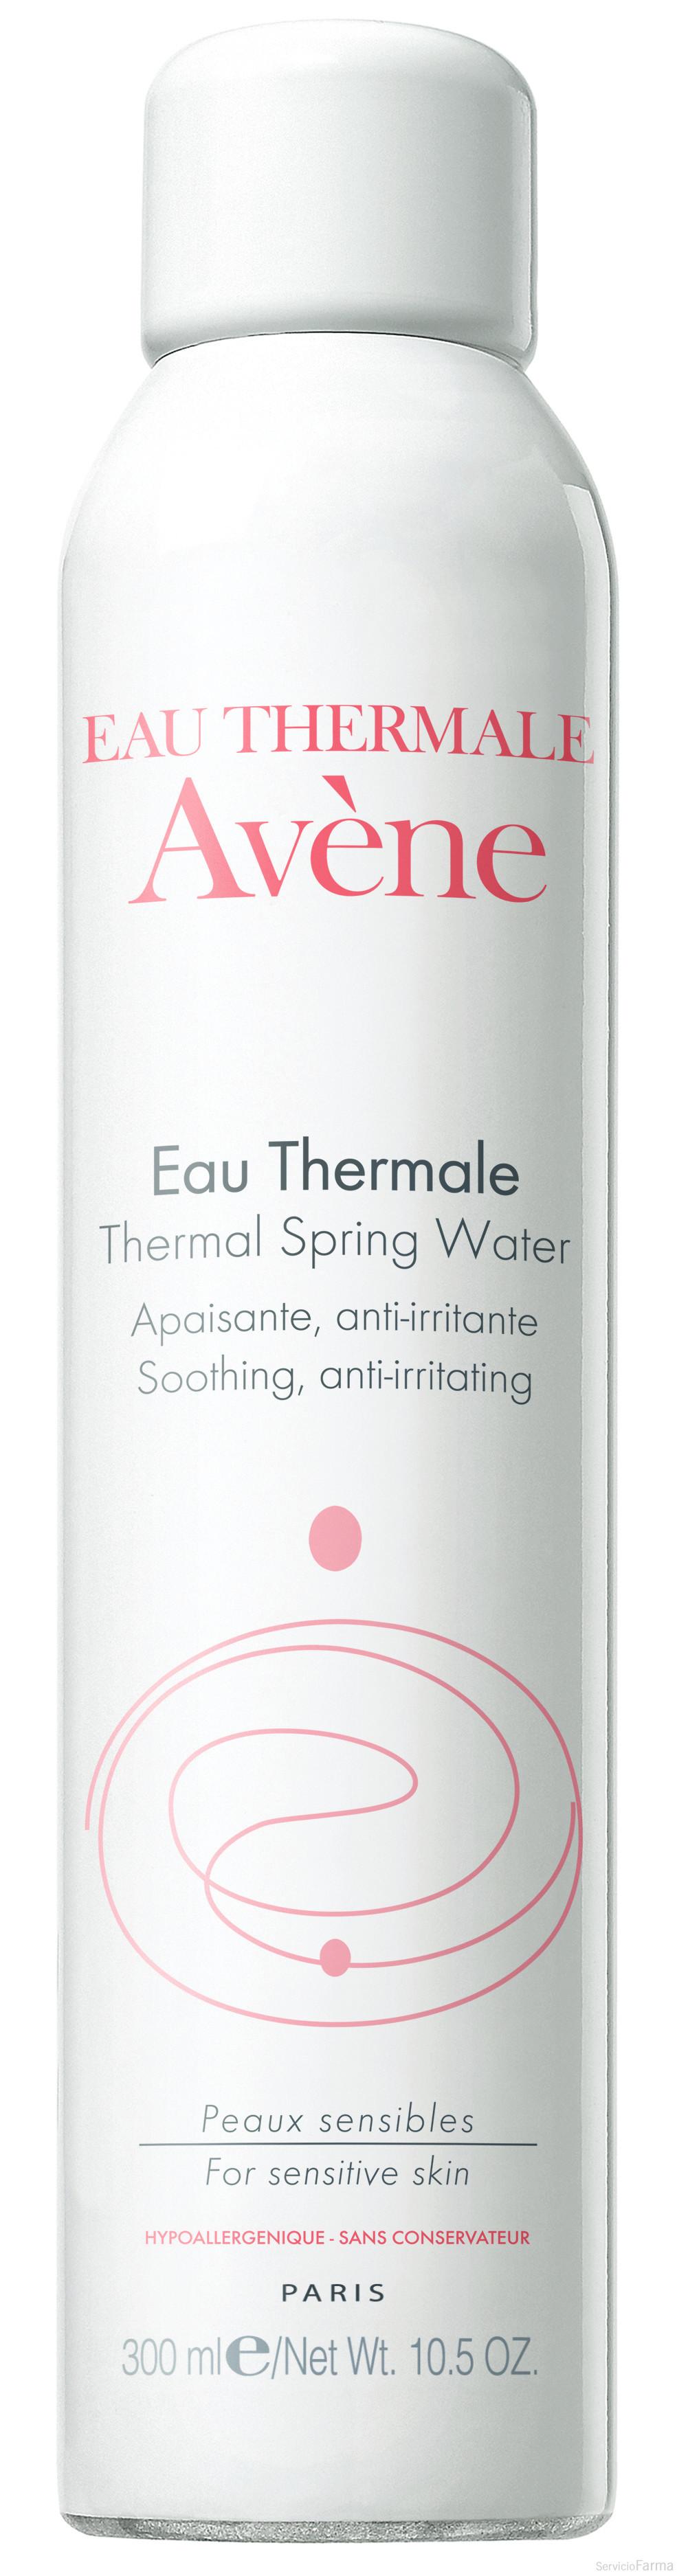 Avene Spray Agua termal 300 ml